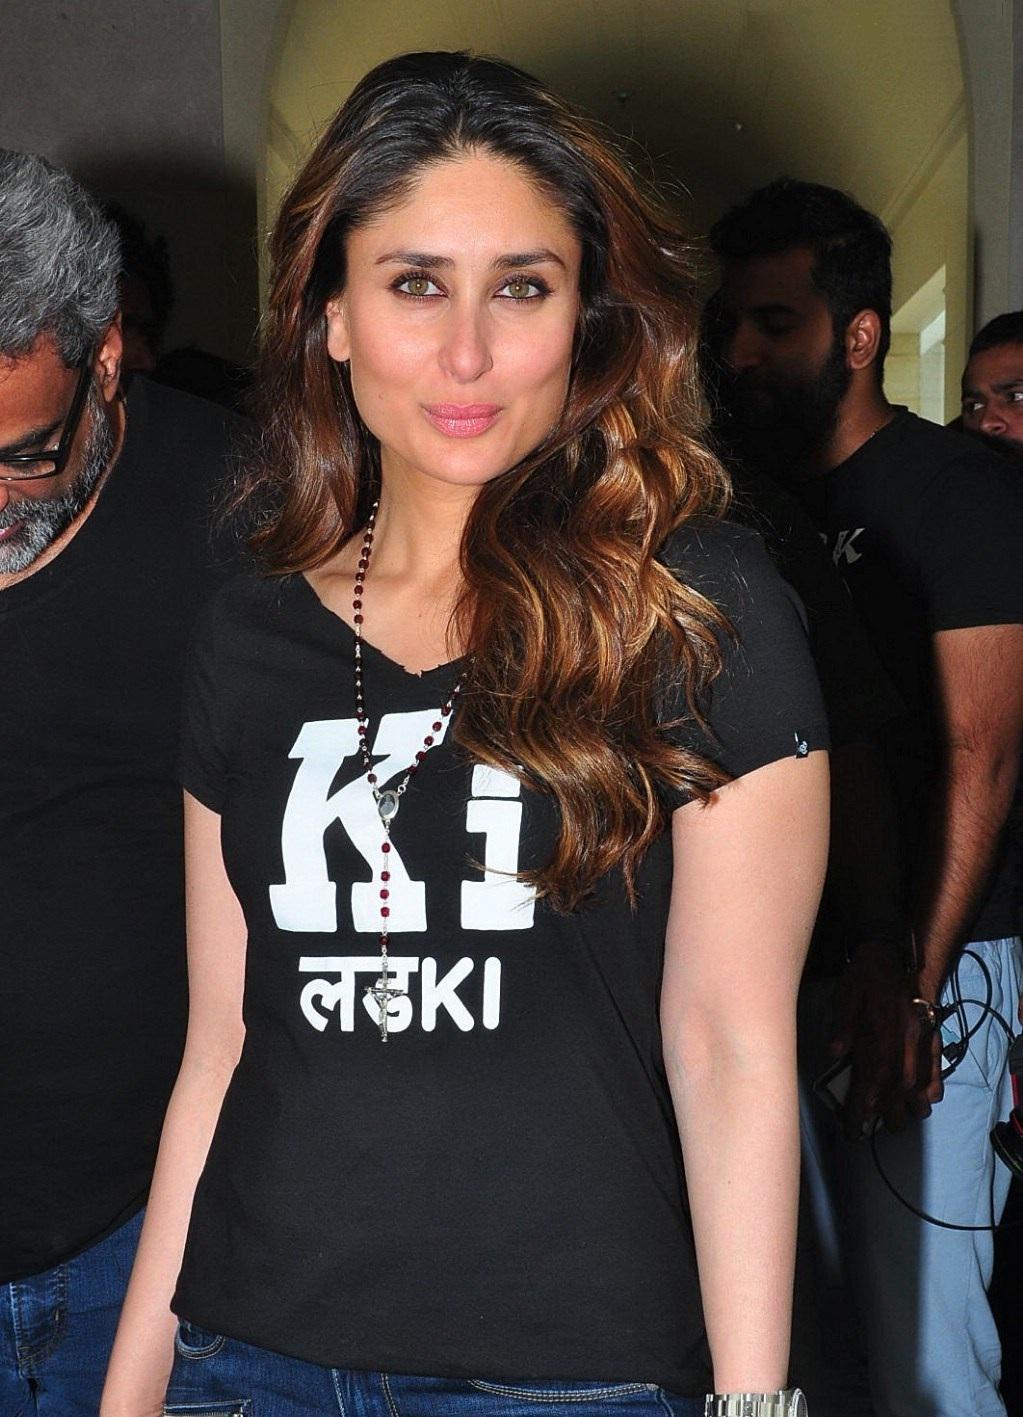 t shirt t shirt kareena Kapoor hot sexy film